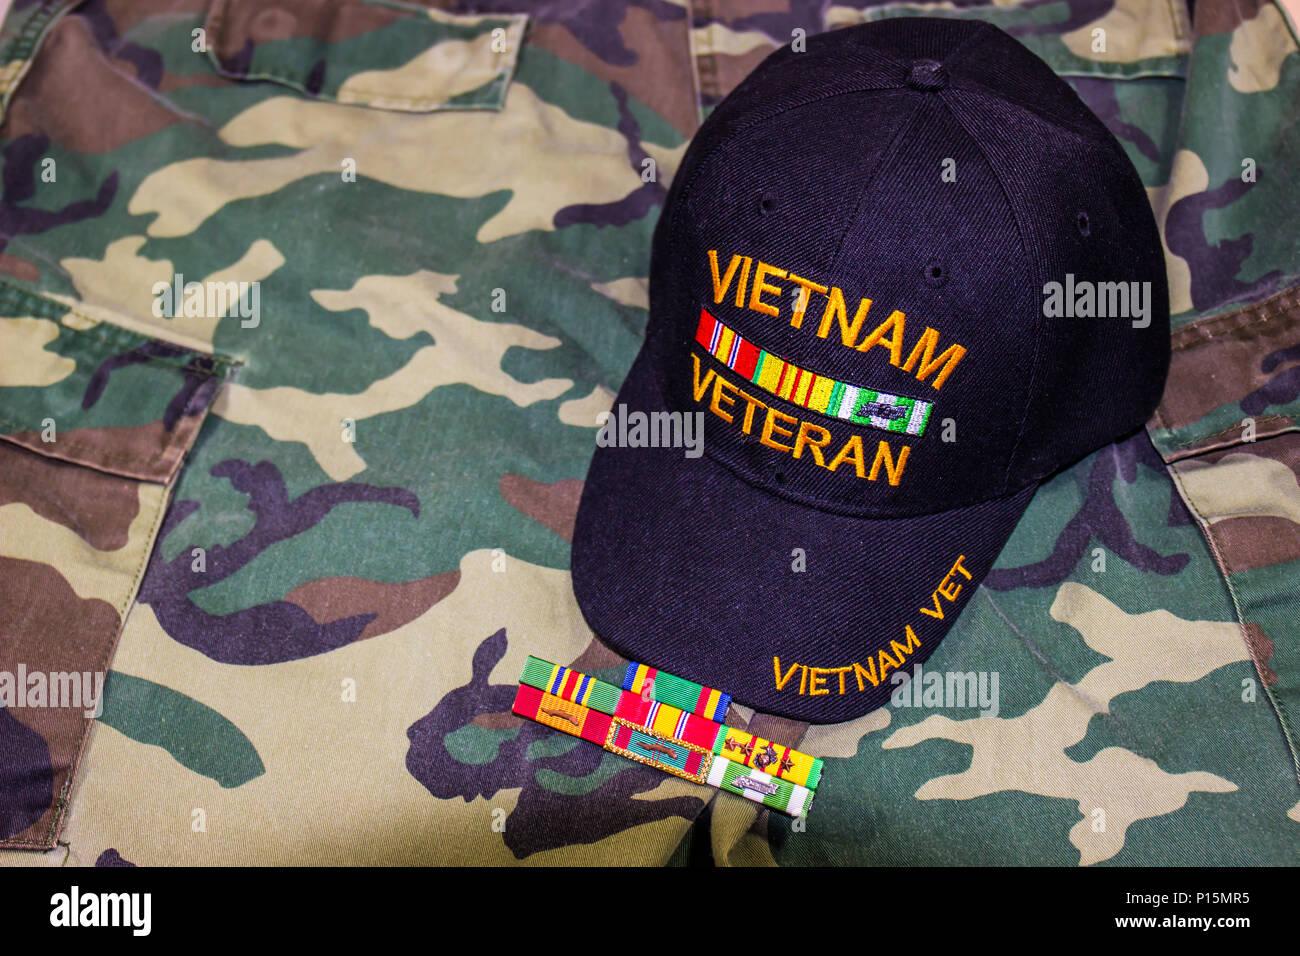 Vietnam Veteran Hat & Service Ribbons On Camouflage Uniform - Stock Image